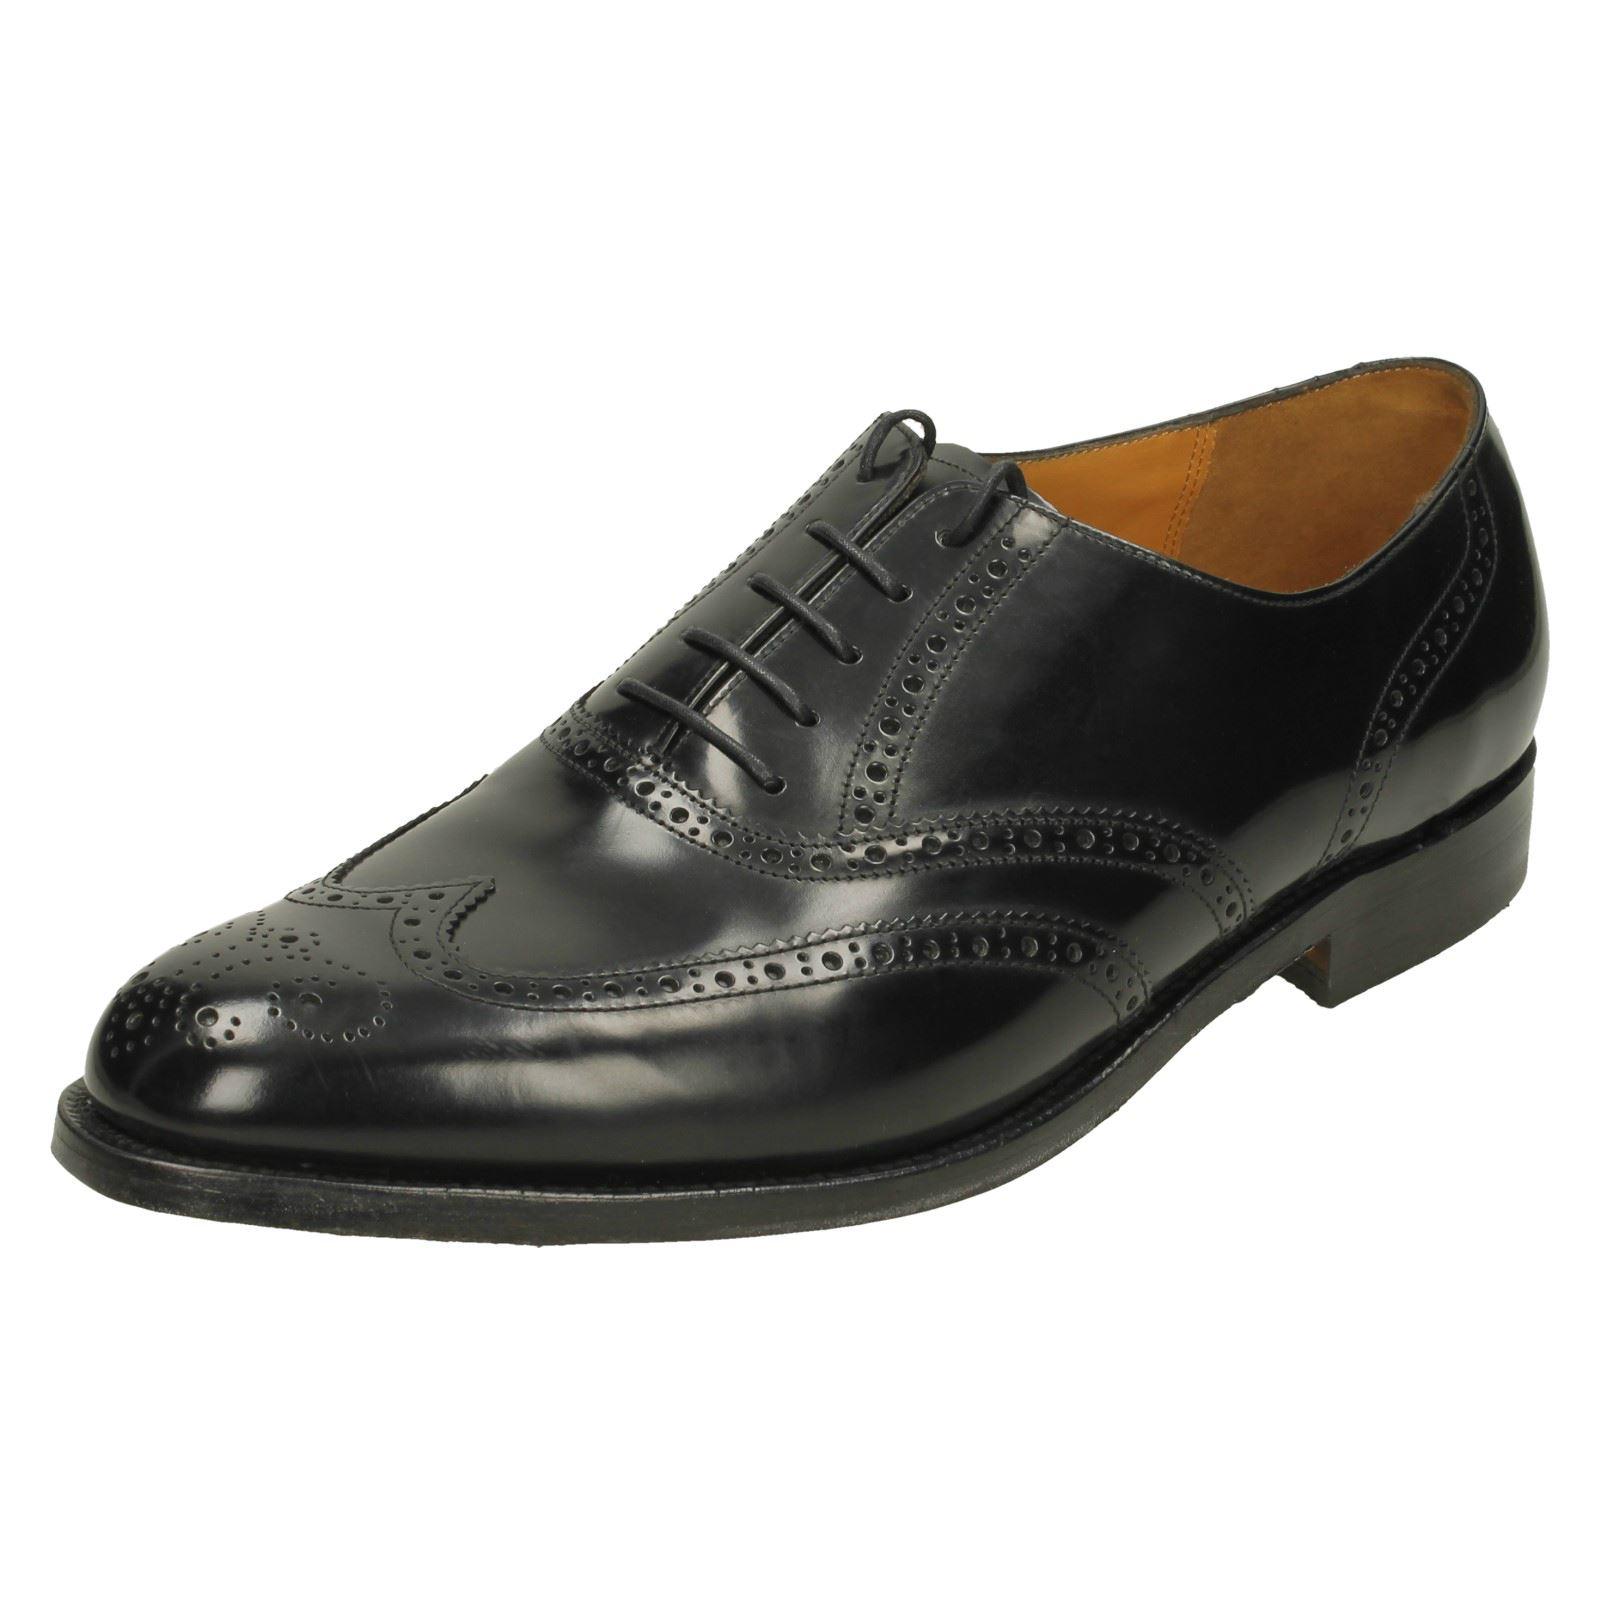 cf1aa999037 Mens Barker Brogue Style Shoes  Albert